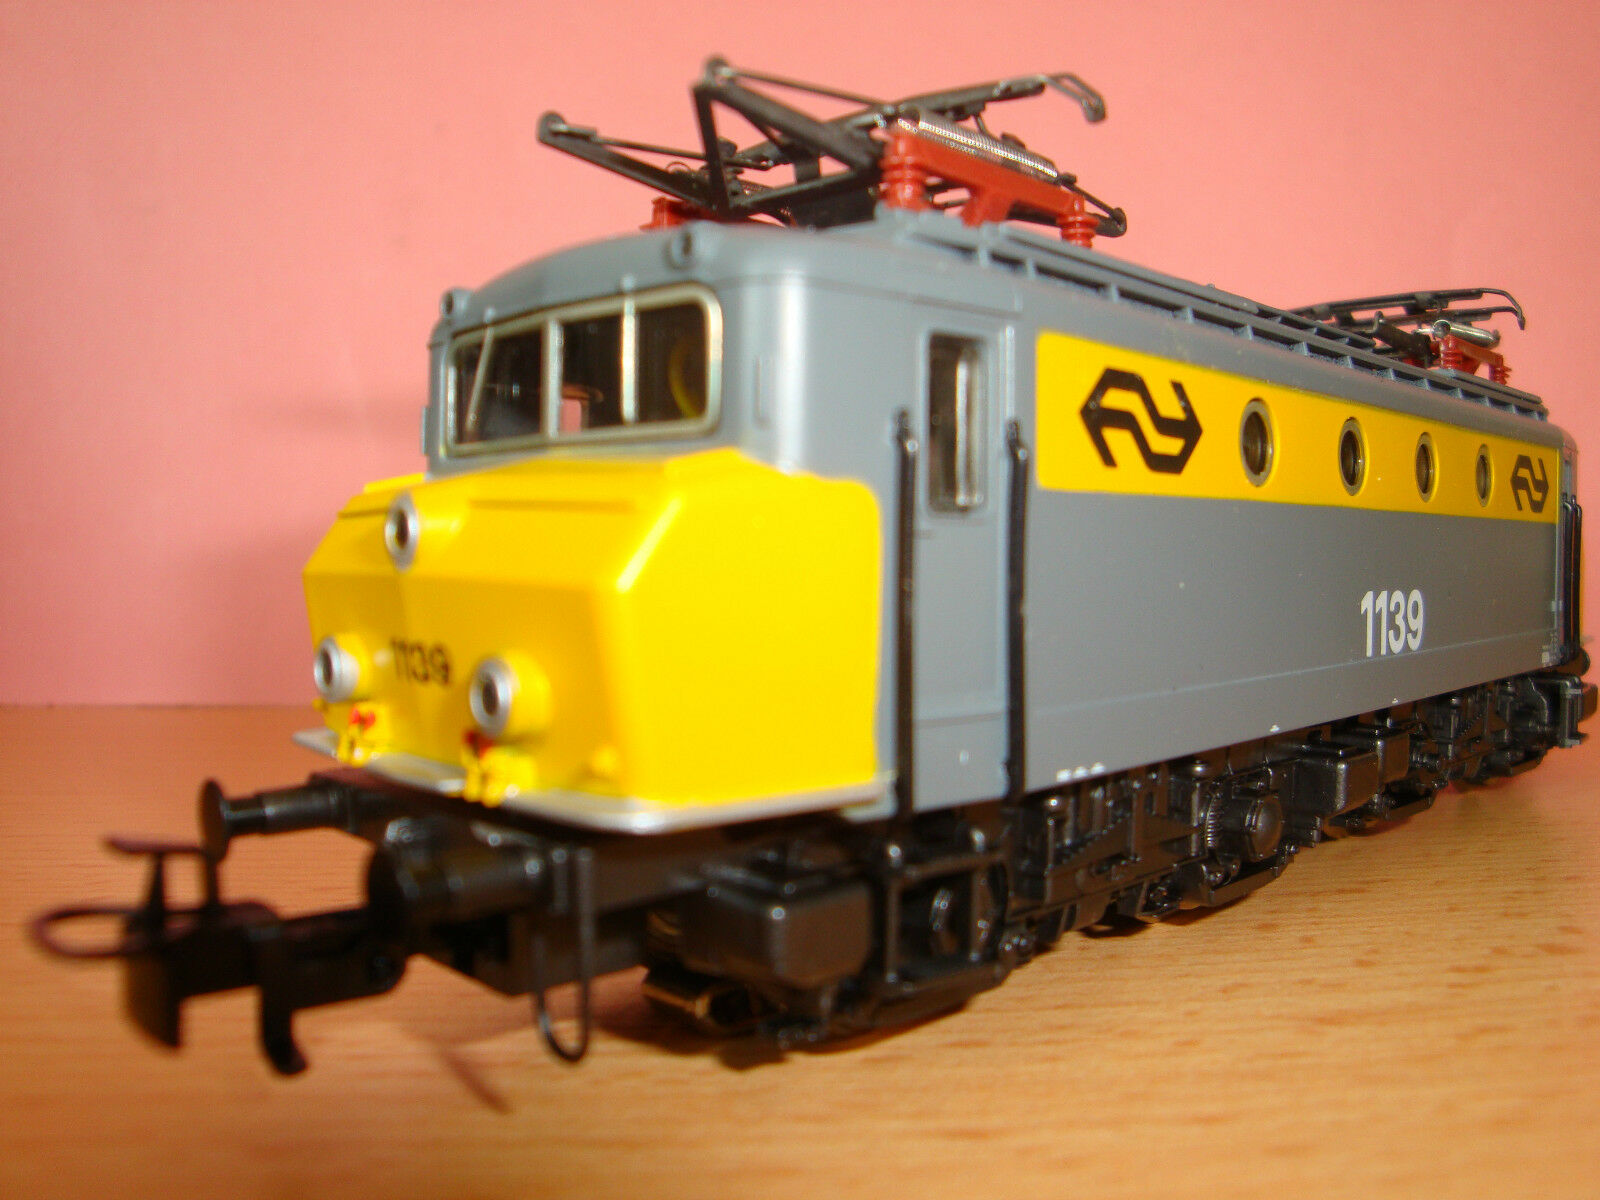 Märklin 3324, E-Lok, E-Lok, E-Lok, BR 1100 der NS, grau gelb, Betr.nr. 1139, im OK  | Vorzügliche Verarbeitung  1f11bd